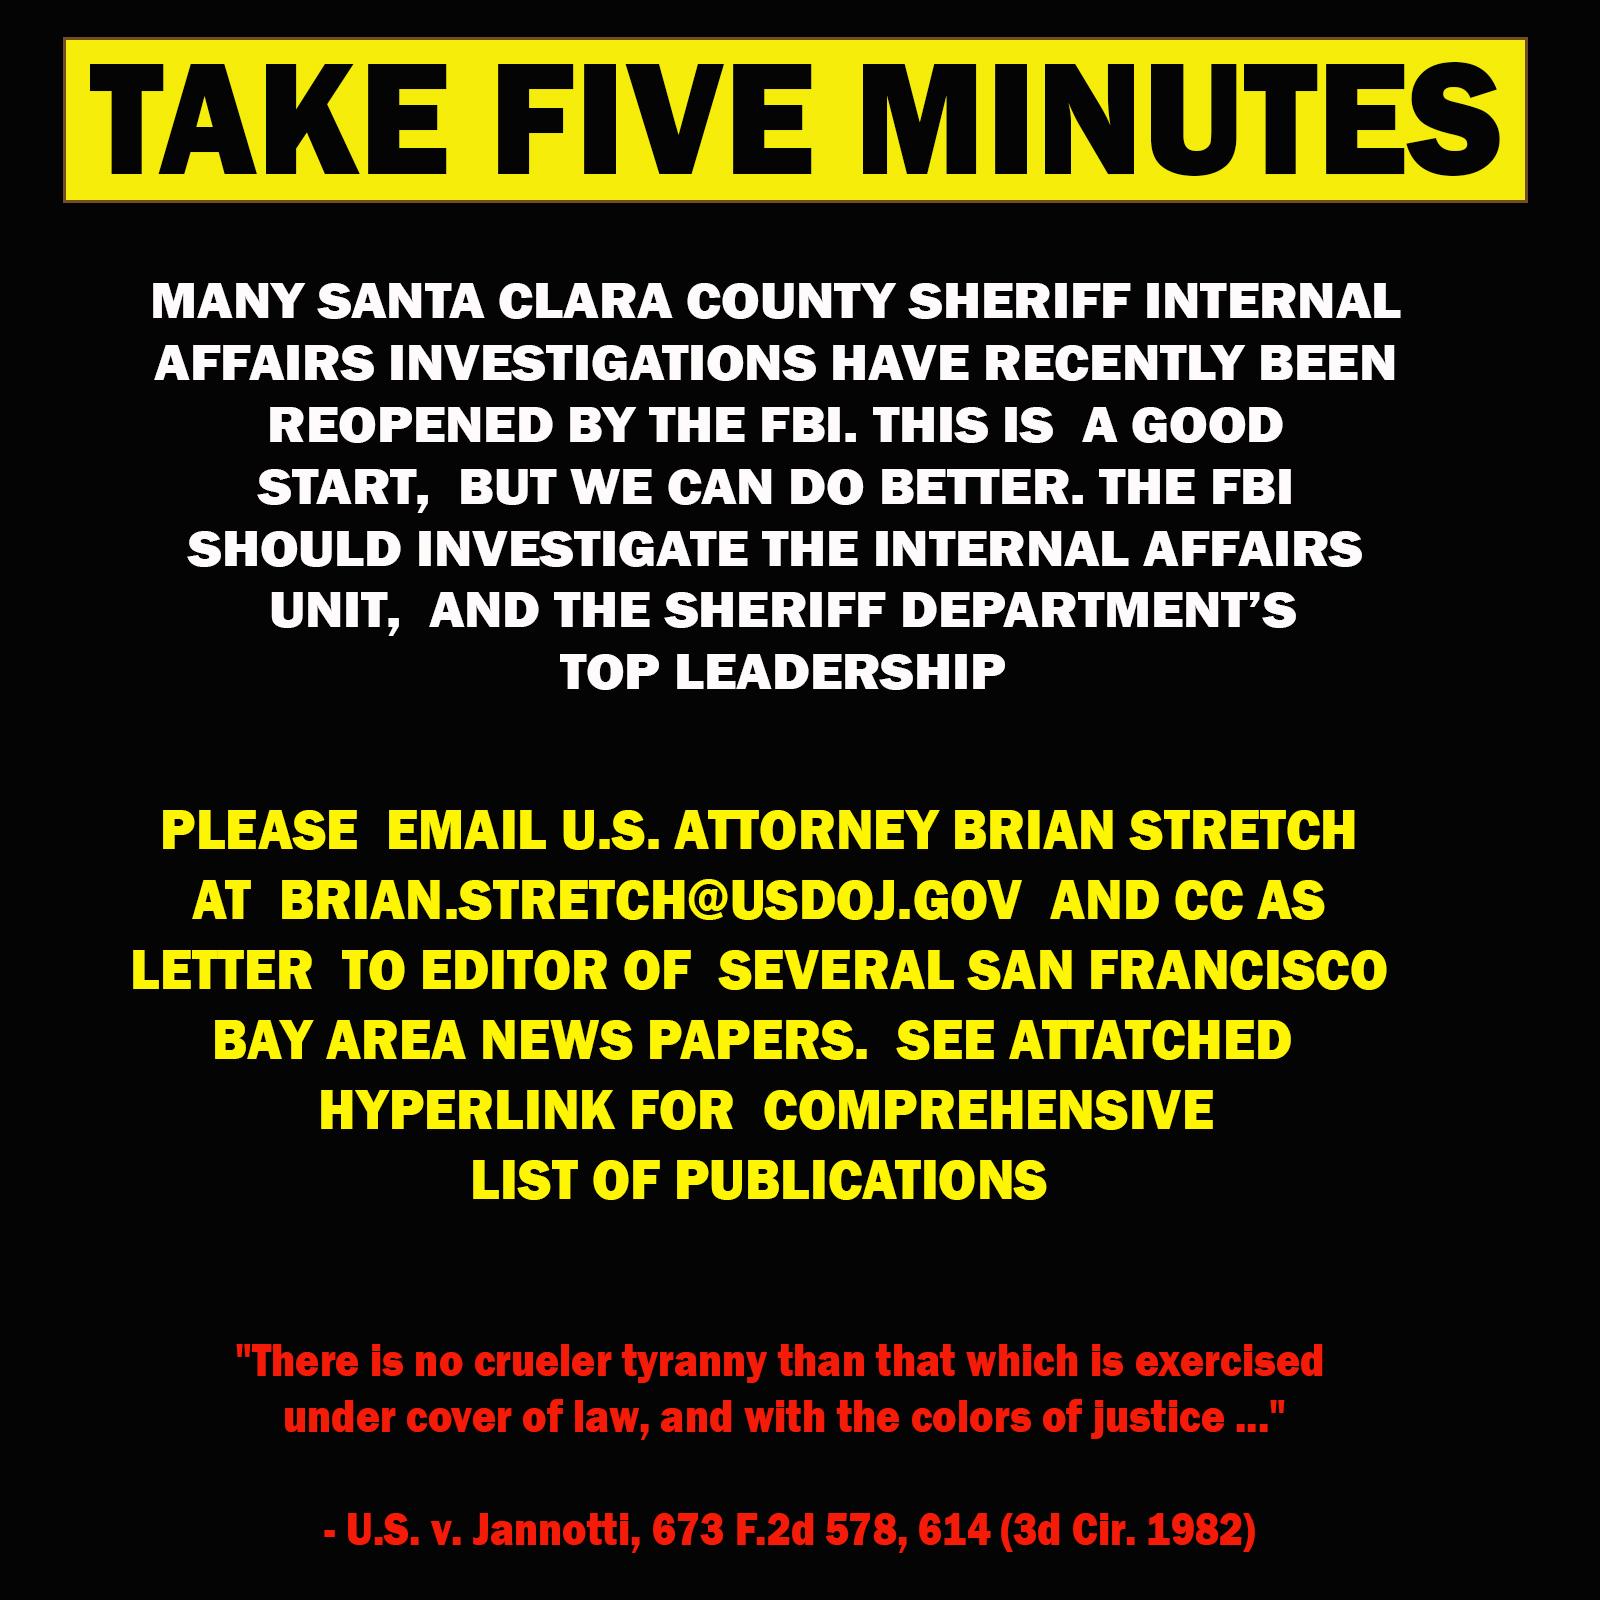 santa-clara-county-sheriff-fbi-investigation-internal-affairs-top-leadership-us-attorney-brian-stretch-police-corruption.jpg